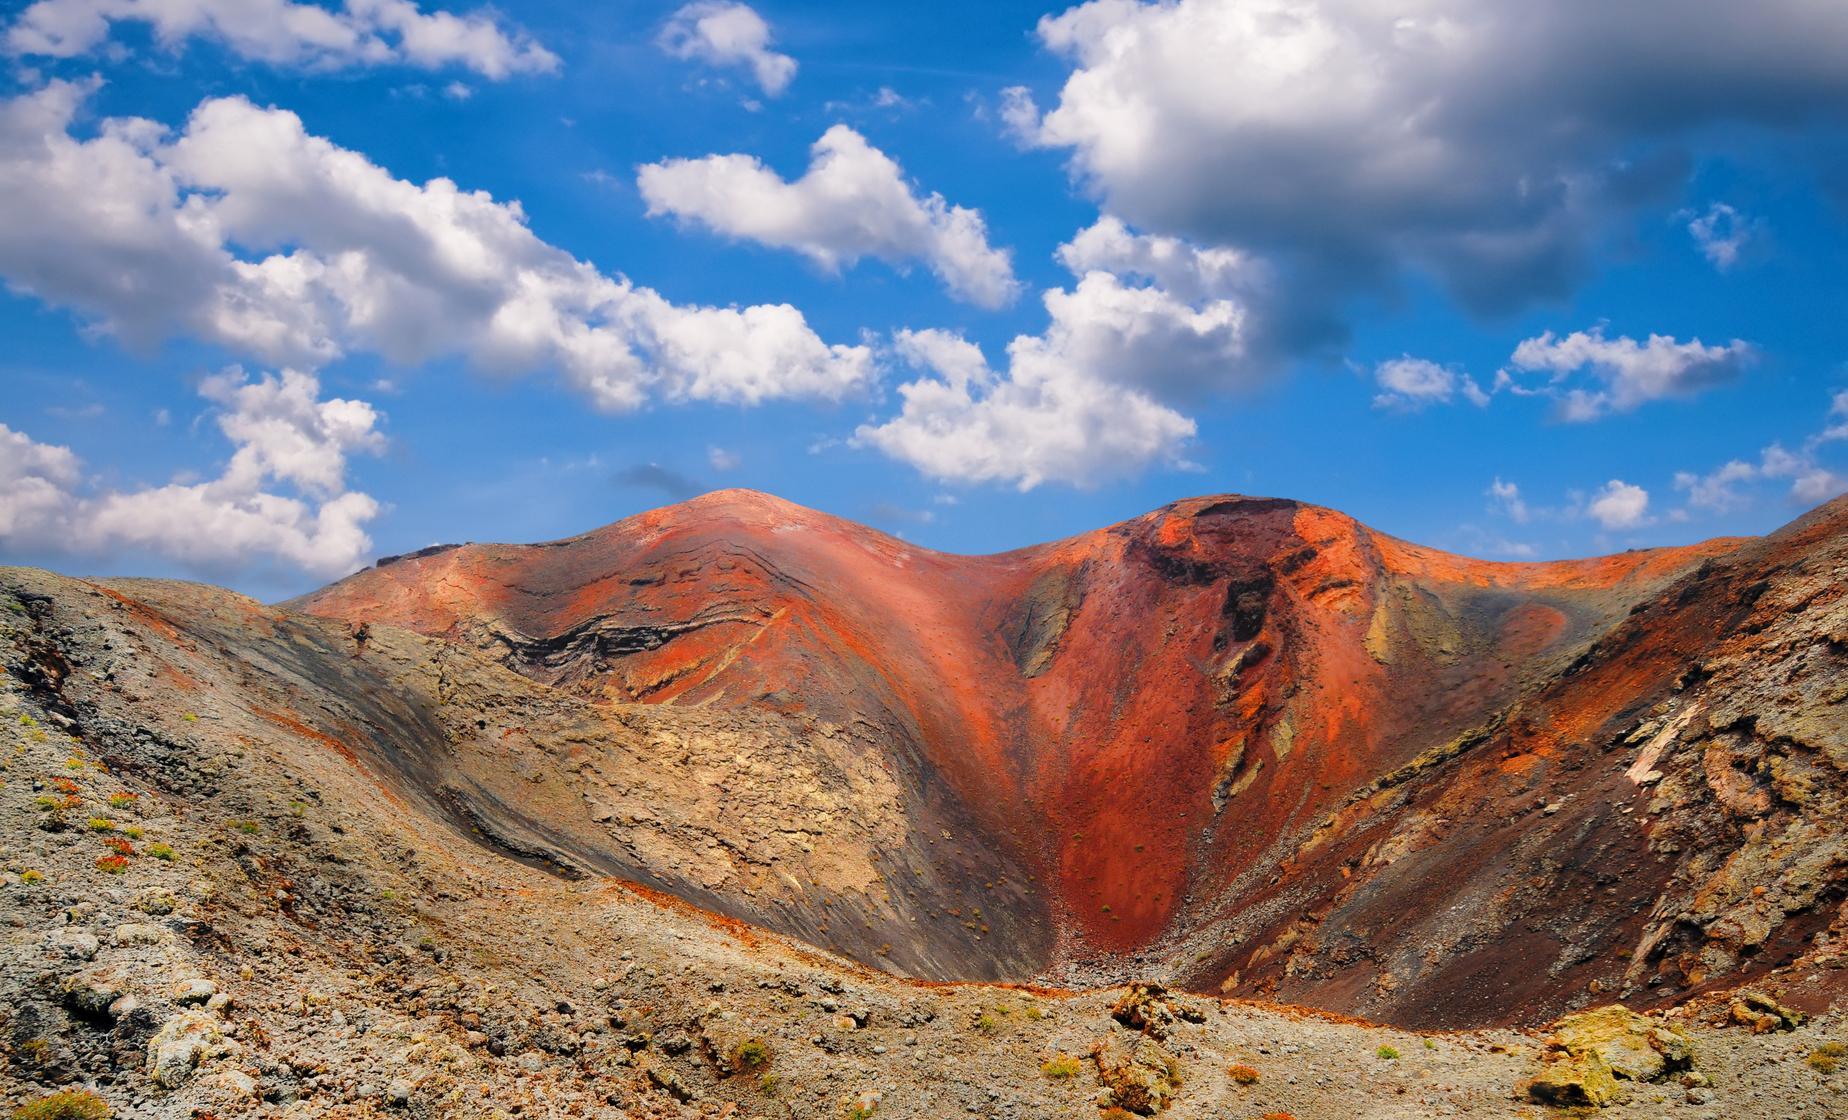 Skip the Line Timanfaya Volcano